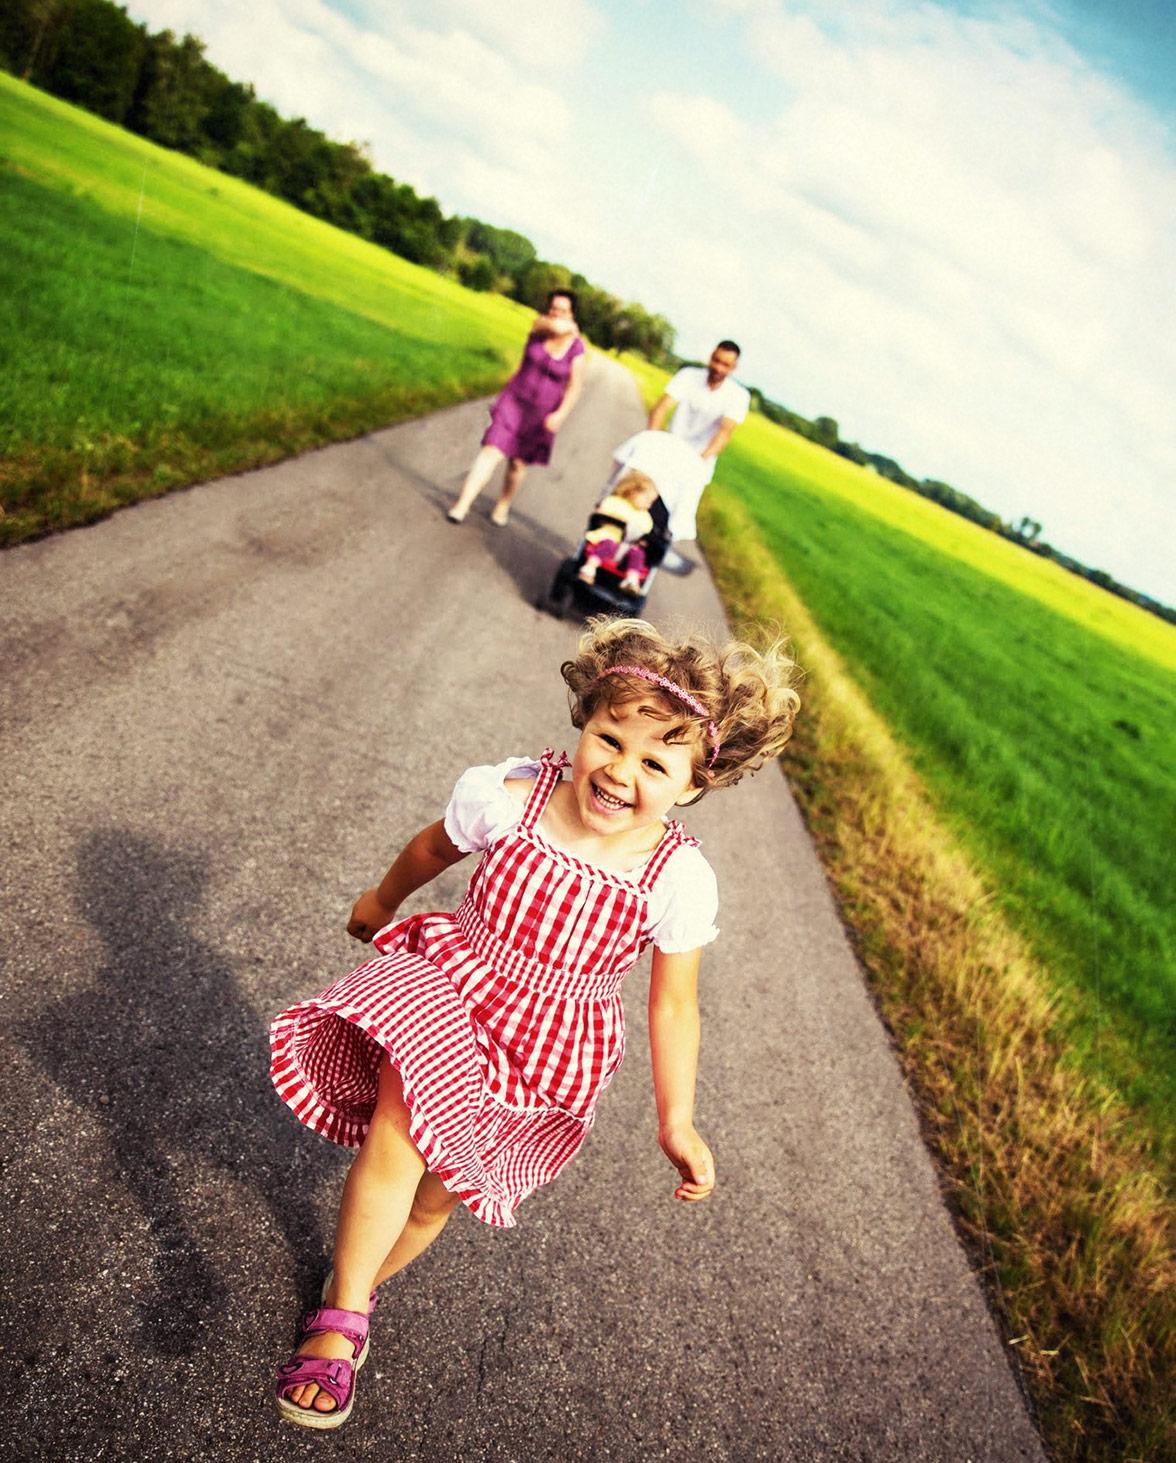 skop: familienfotoshooting beim spaziergang in ffb